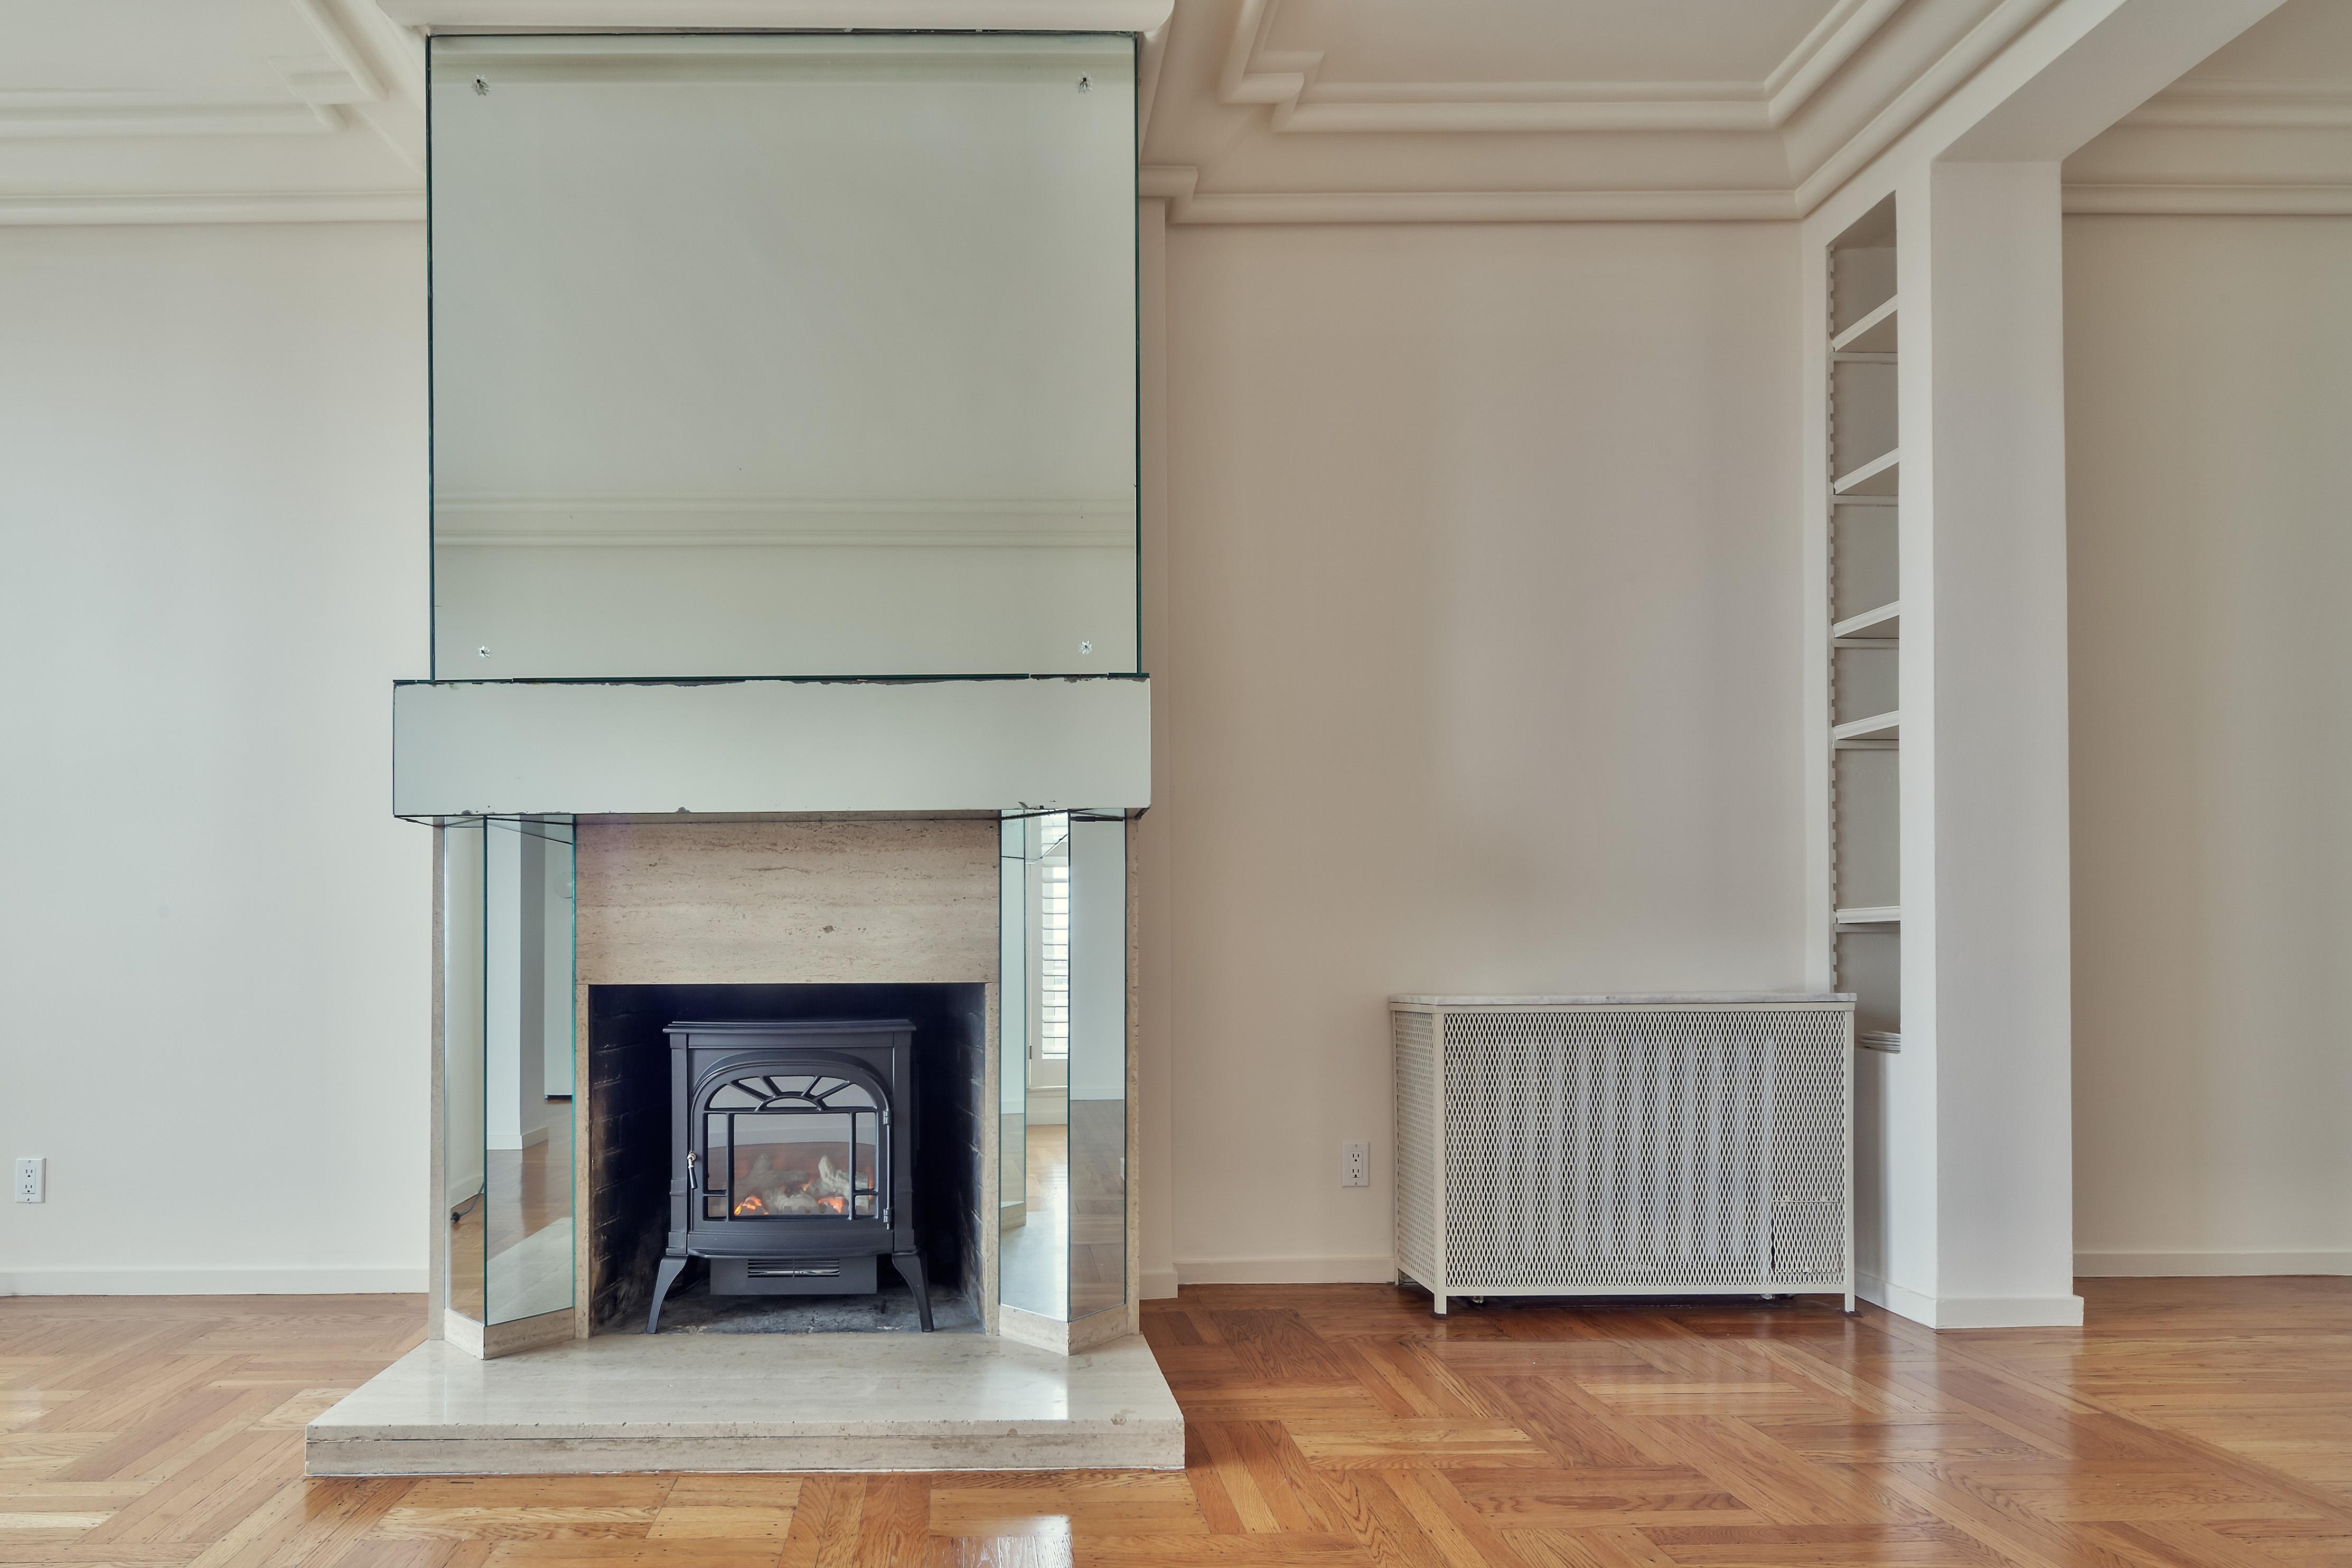 Black Fireplace Inside Wall